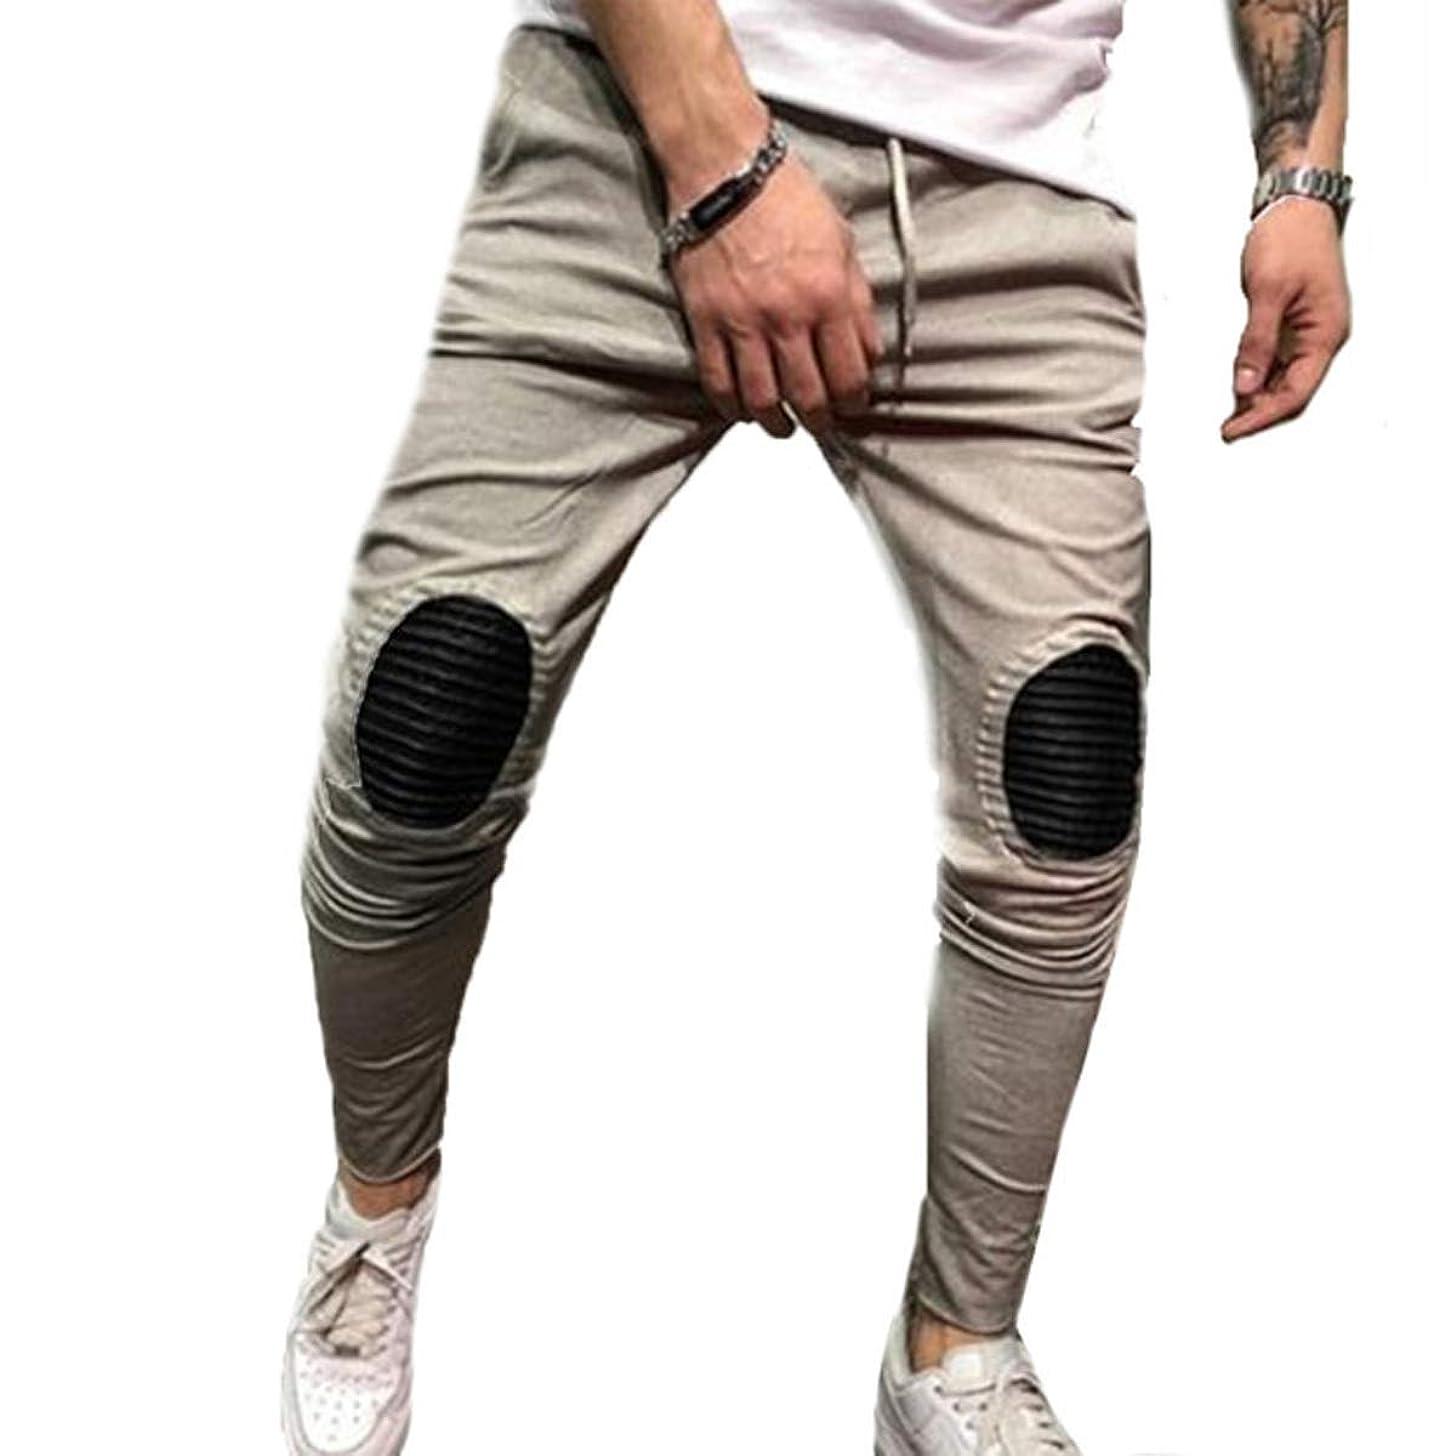 Fmeijia Men's Sports Fitness Pants Spring Autumn Hip Hop Fashion Style Trousers Workout Track Pants